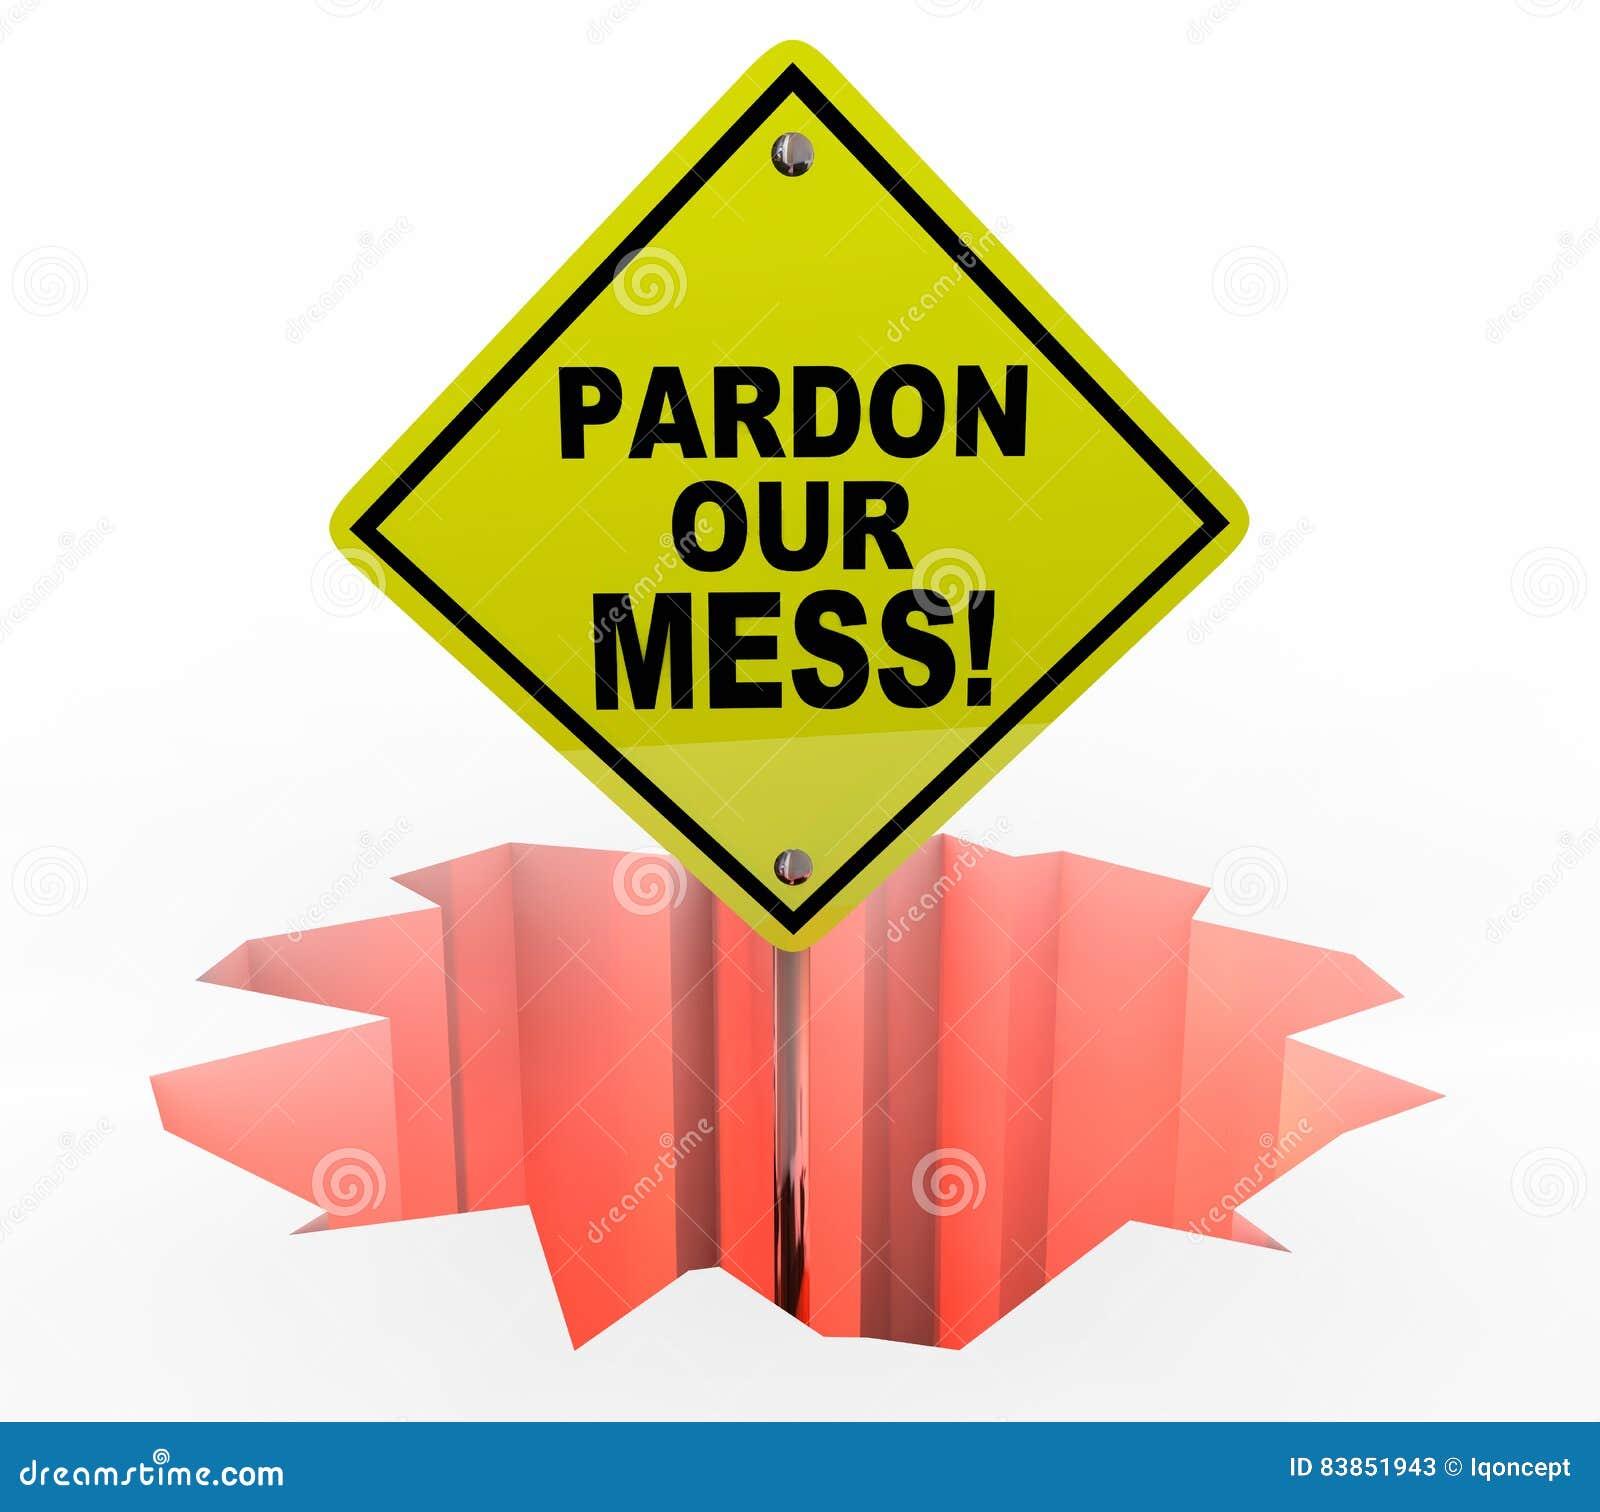 Pardon Our Mess Construction Excuse Us Sign